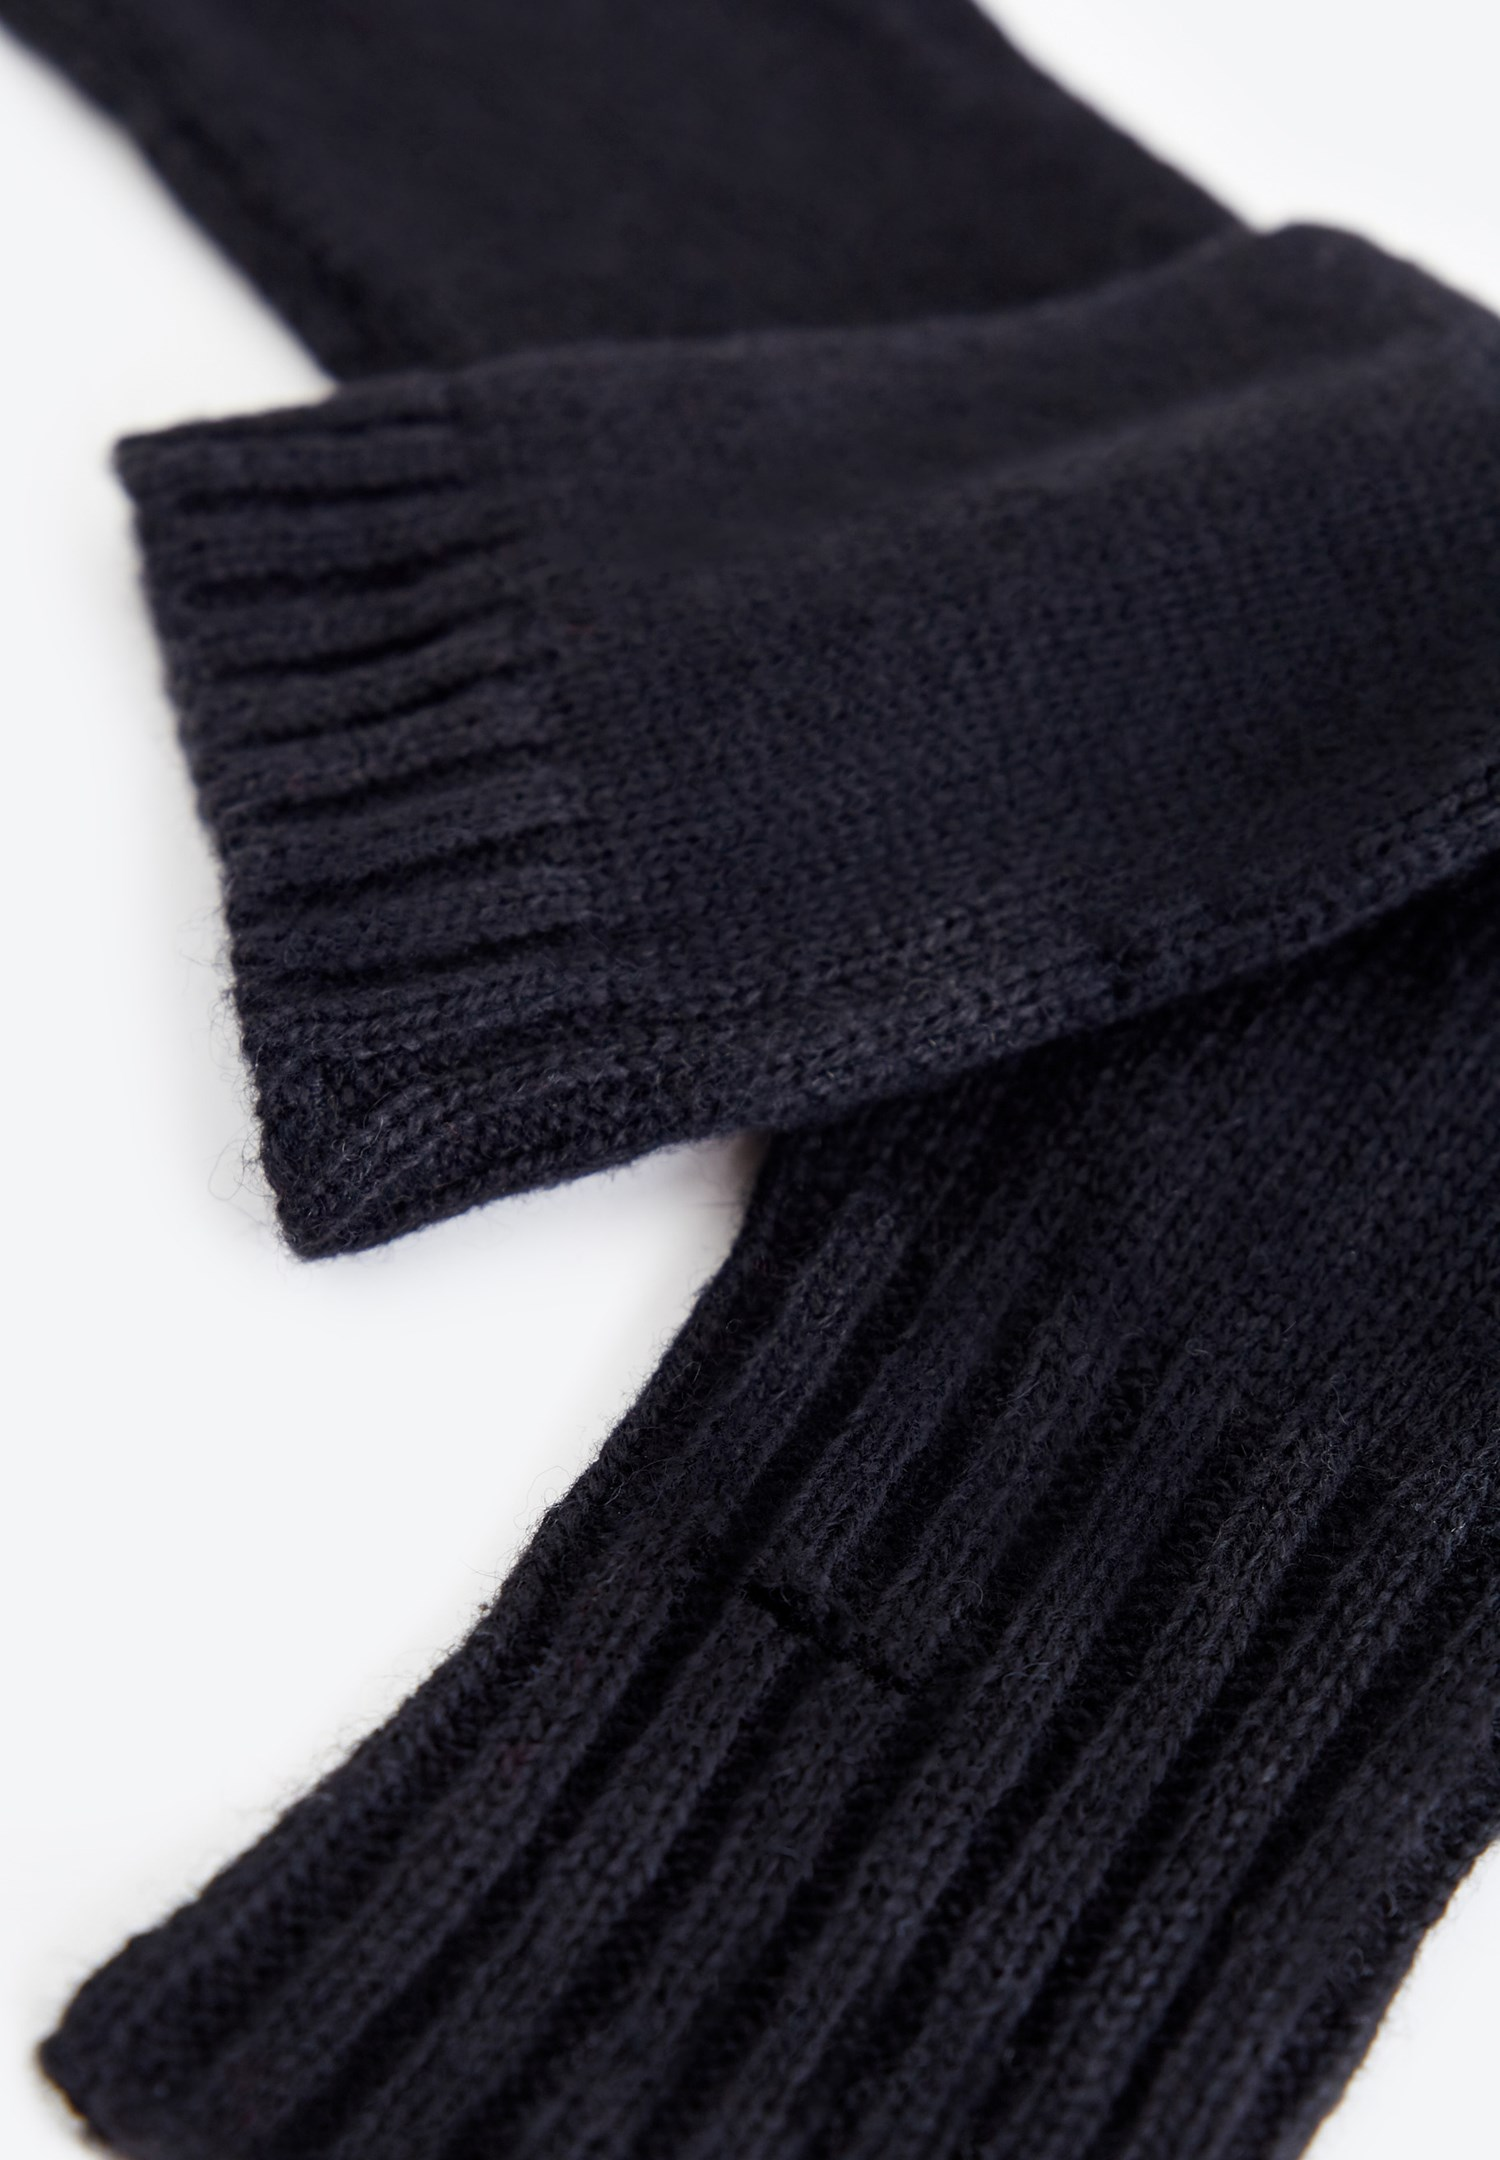 Bayan Siyah Dokulu Uzun Eldiven